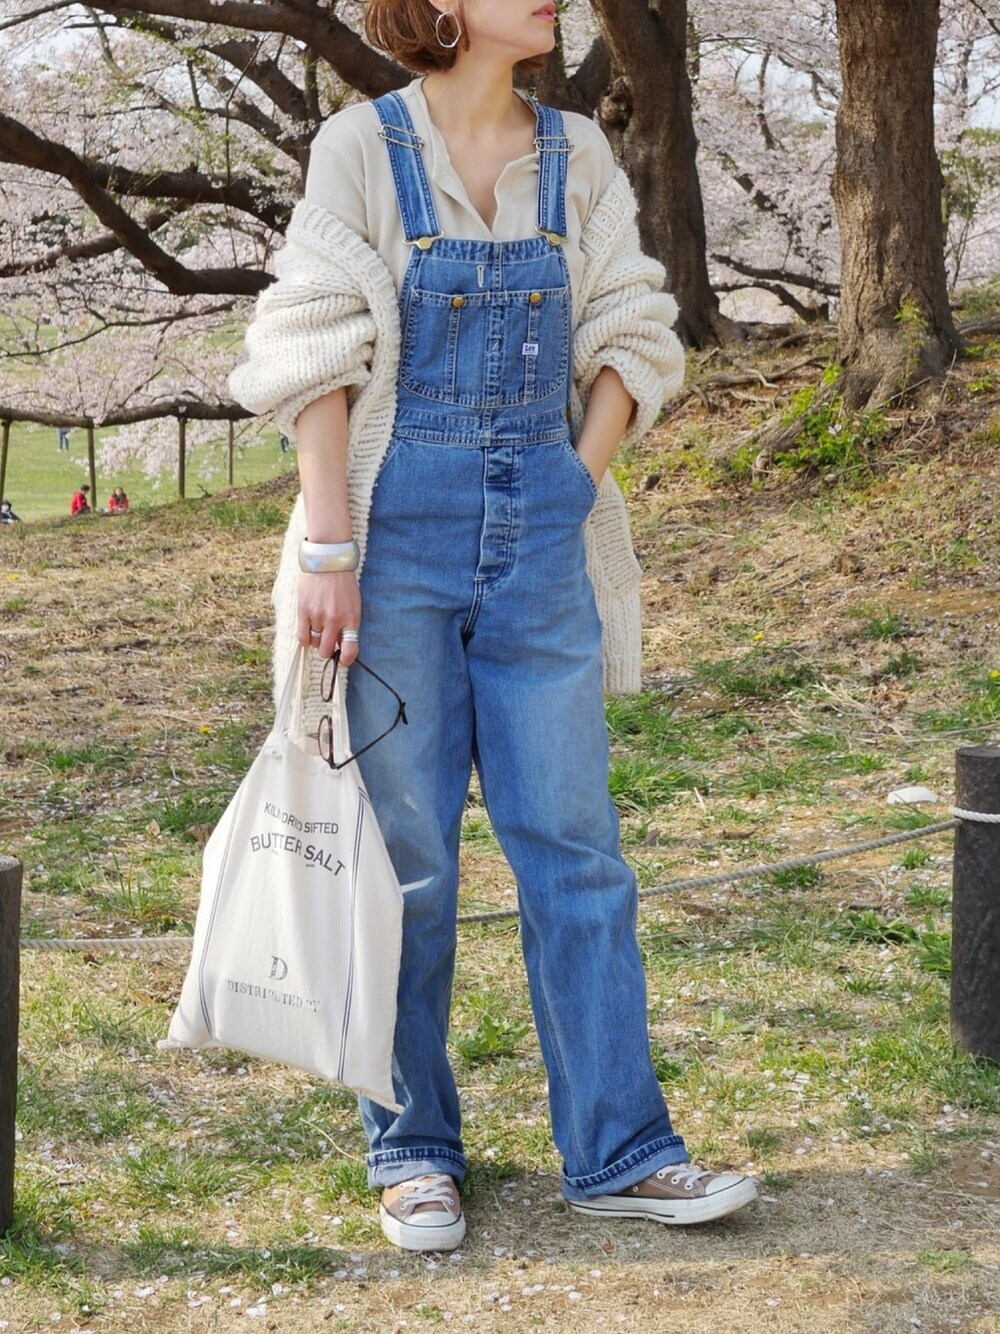 BBQ コーデ 春 アウトドア ファッション おしゃれ ママ リンク Lee オーバーオール